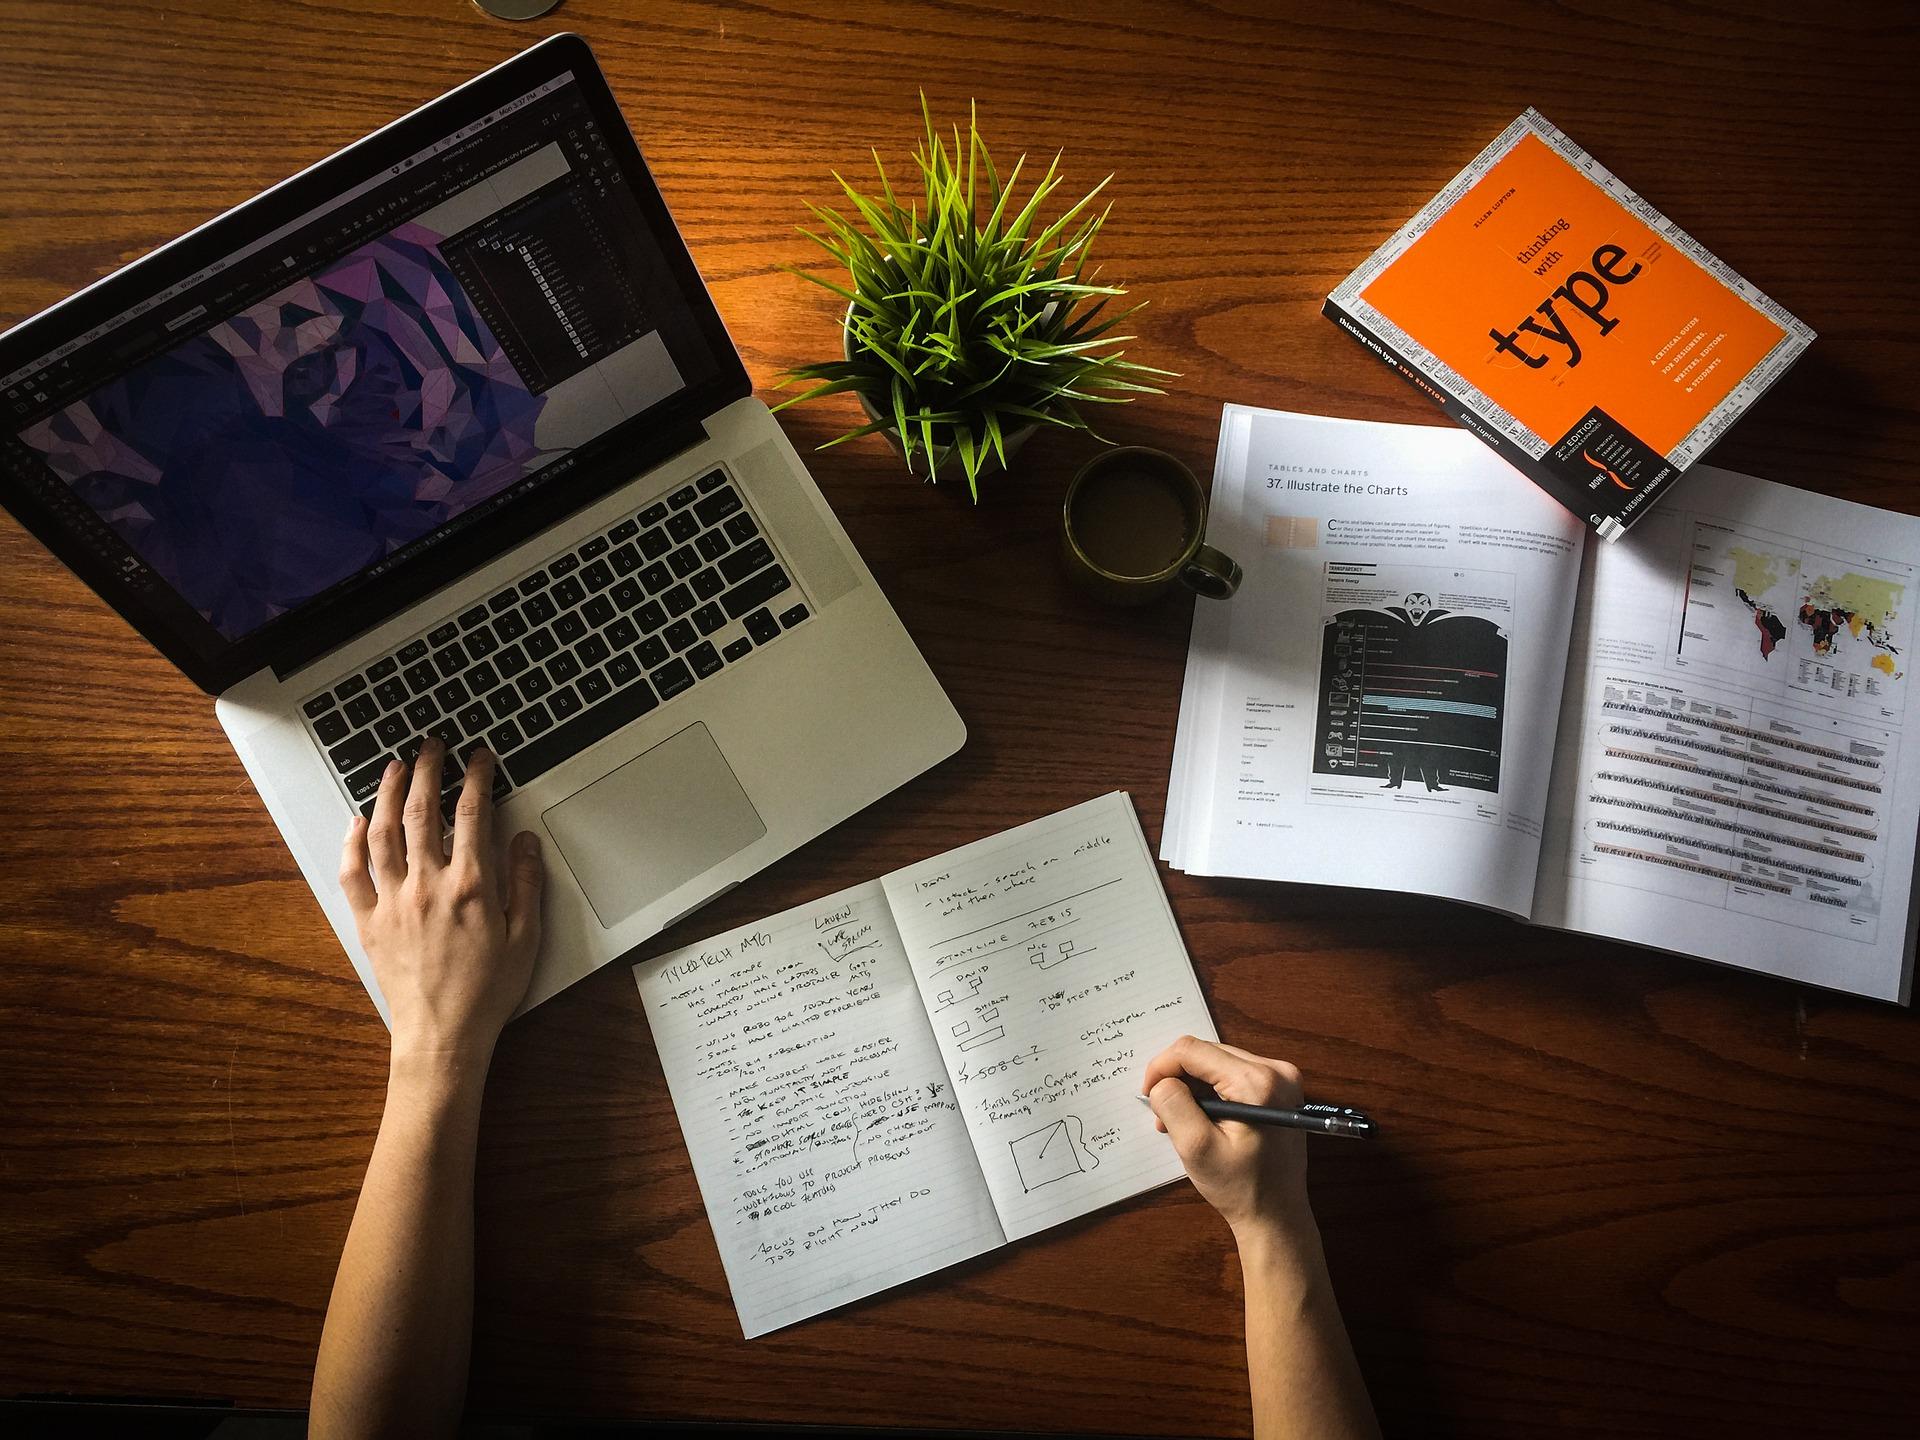 workspace-how-to-negotiate-salary.jpg